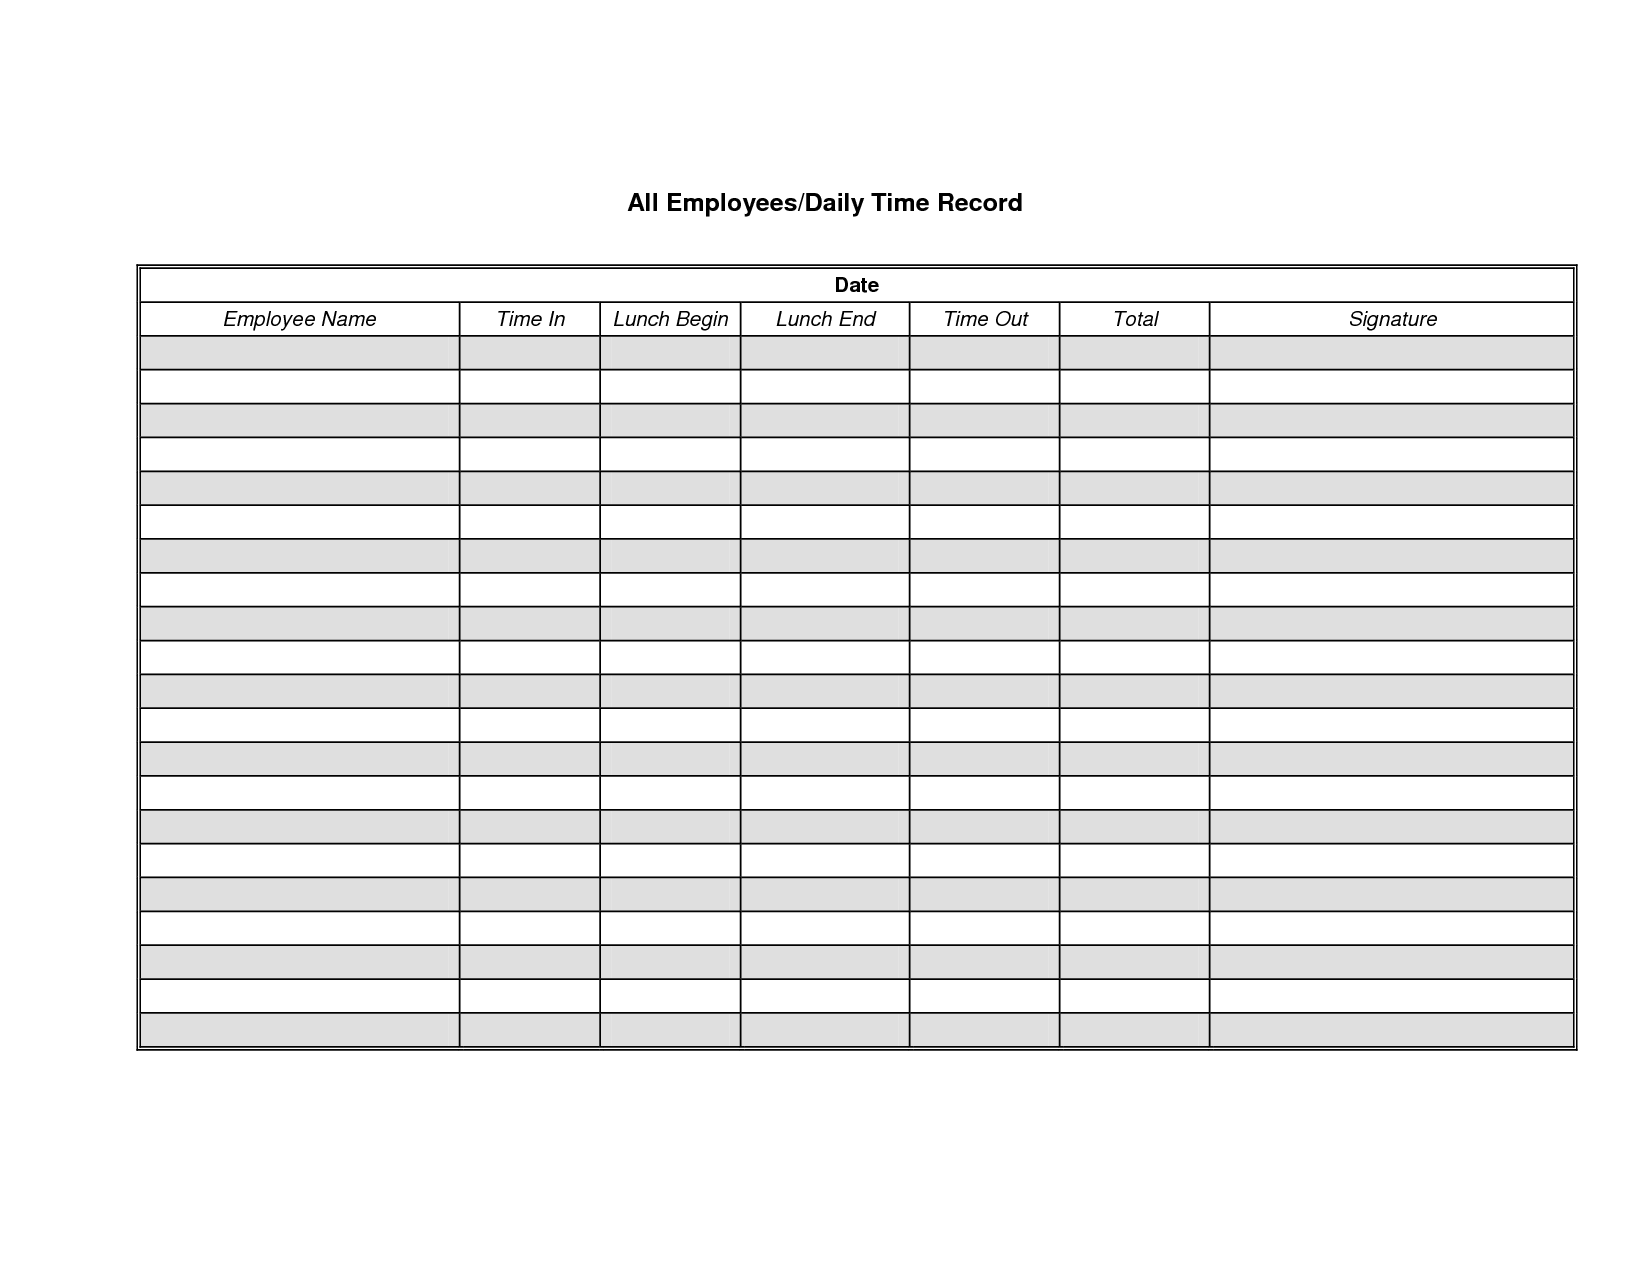 Employee Time Record Sheet Printable Editable Blank – Printable Time Card Template